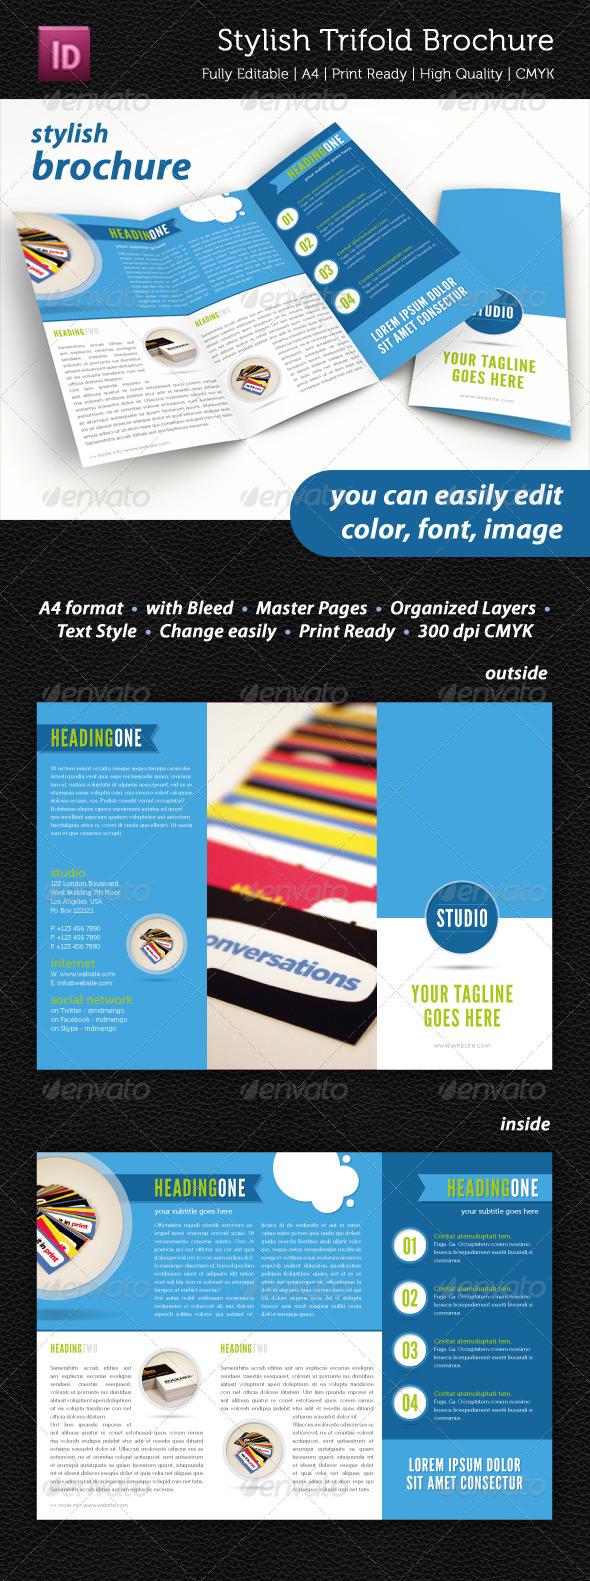 GraphicRiver Stylish Trifold Brochure 2346619